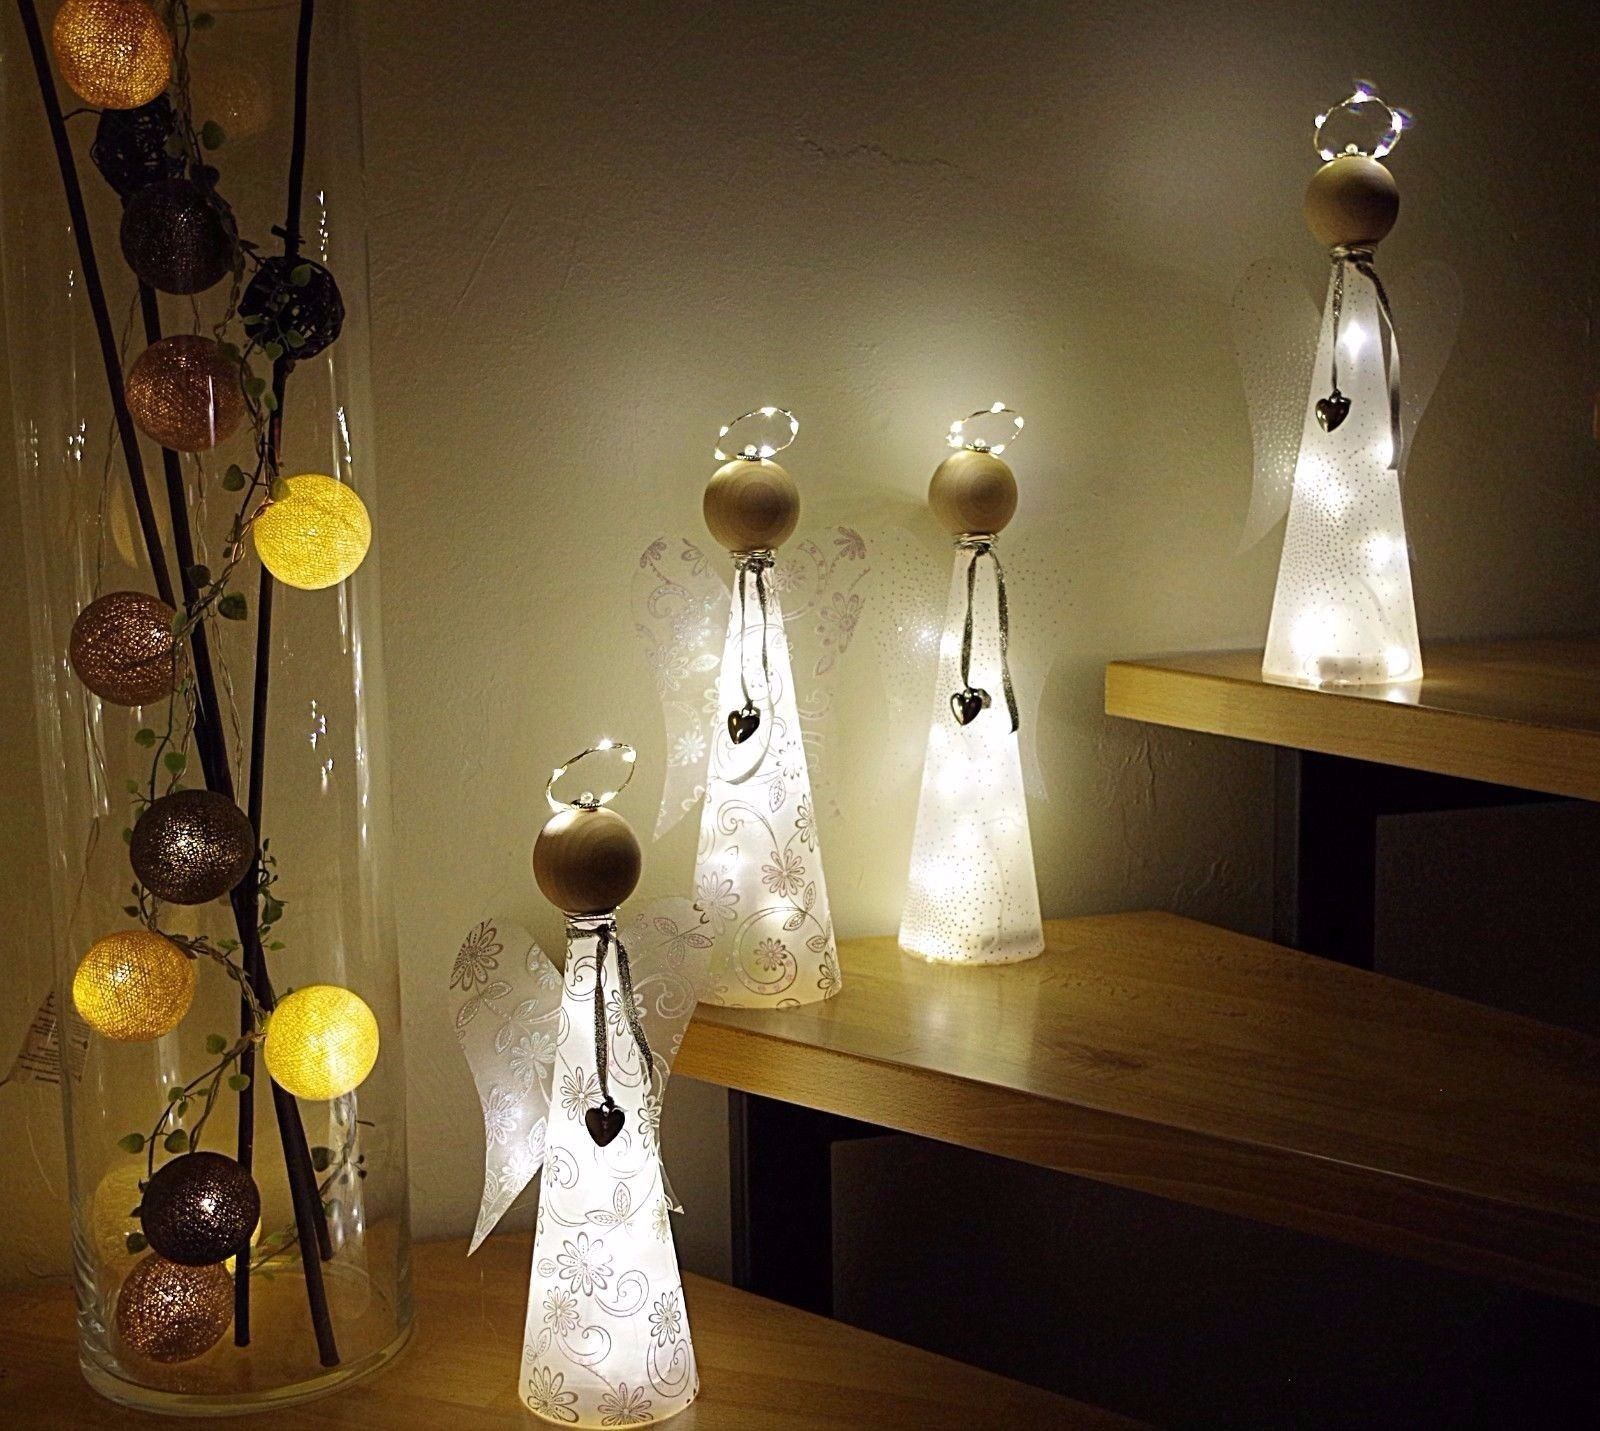 bastelanleitung material f beleuchteten engel lichterkette basteln bastelset ebay engel. Black Bedroom Furniture Sets. Home Design Ideas